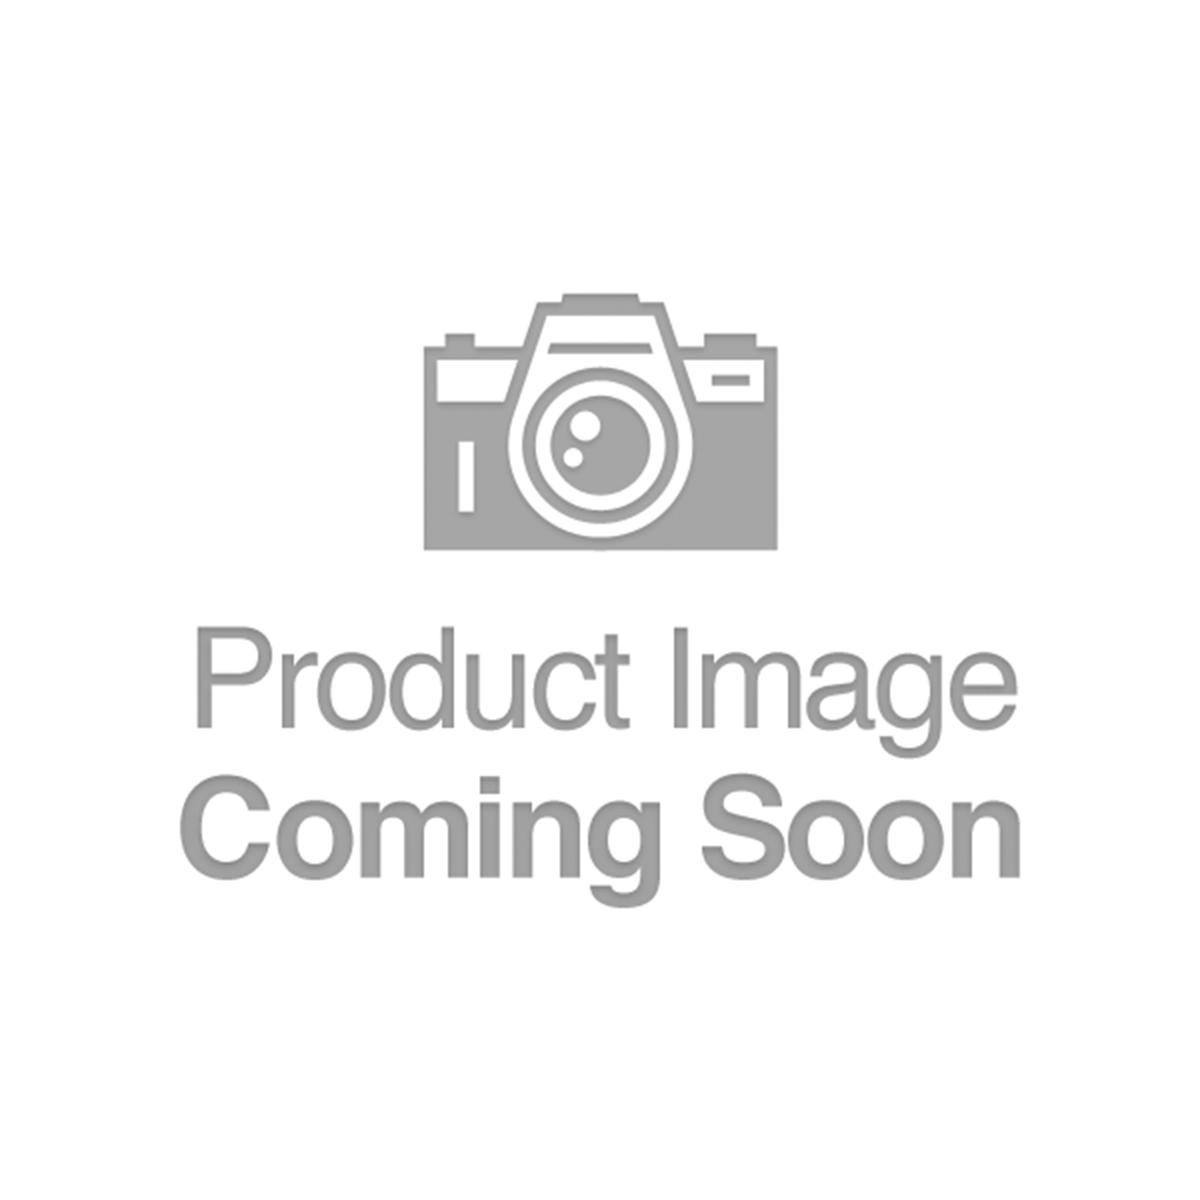 Cynthiana - Kentucky - CH 1900 - PMG 15